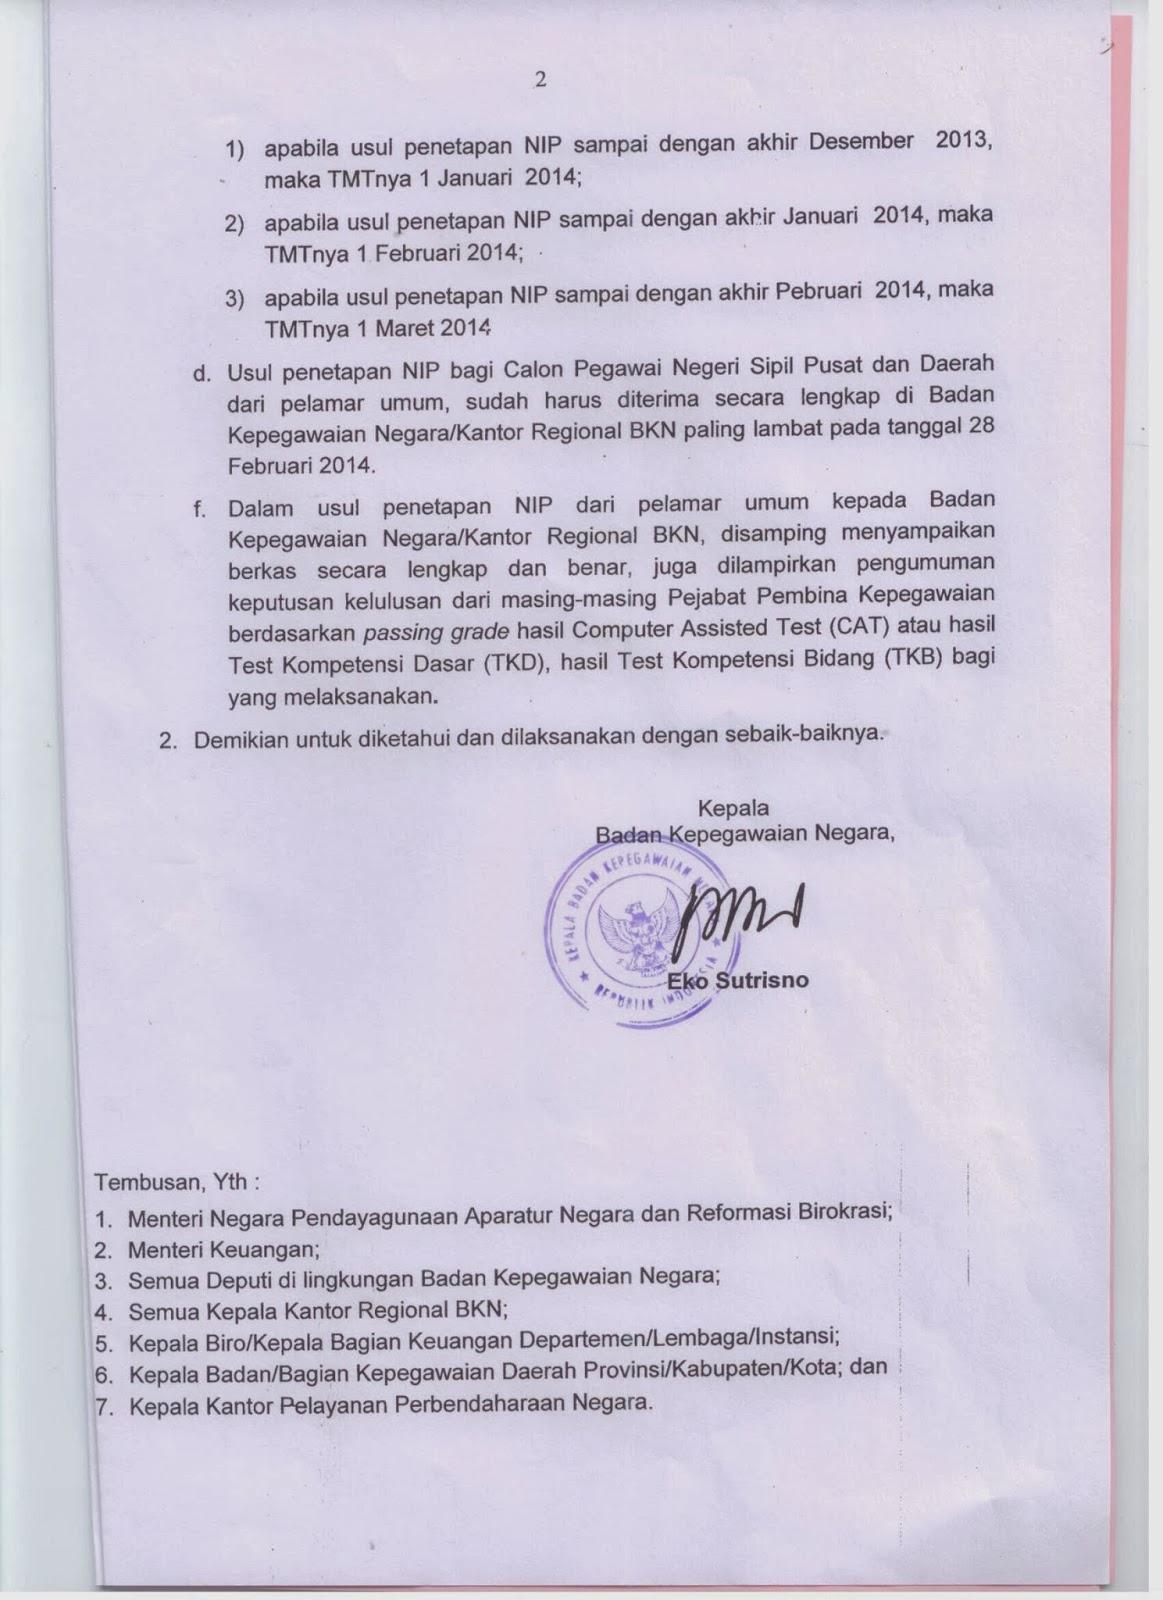 Lowongan Kerja Ngawi Februari 2013 Terbaru Pengumuman Pendaftaran Calon Bintara Pk Tni Au Agustus Pengumuman Kelulusan Cpns Honorer K2 Instansi Pusat Share The